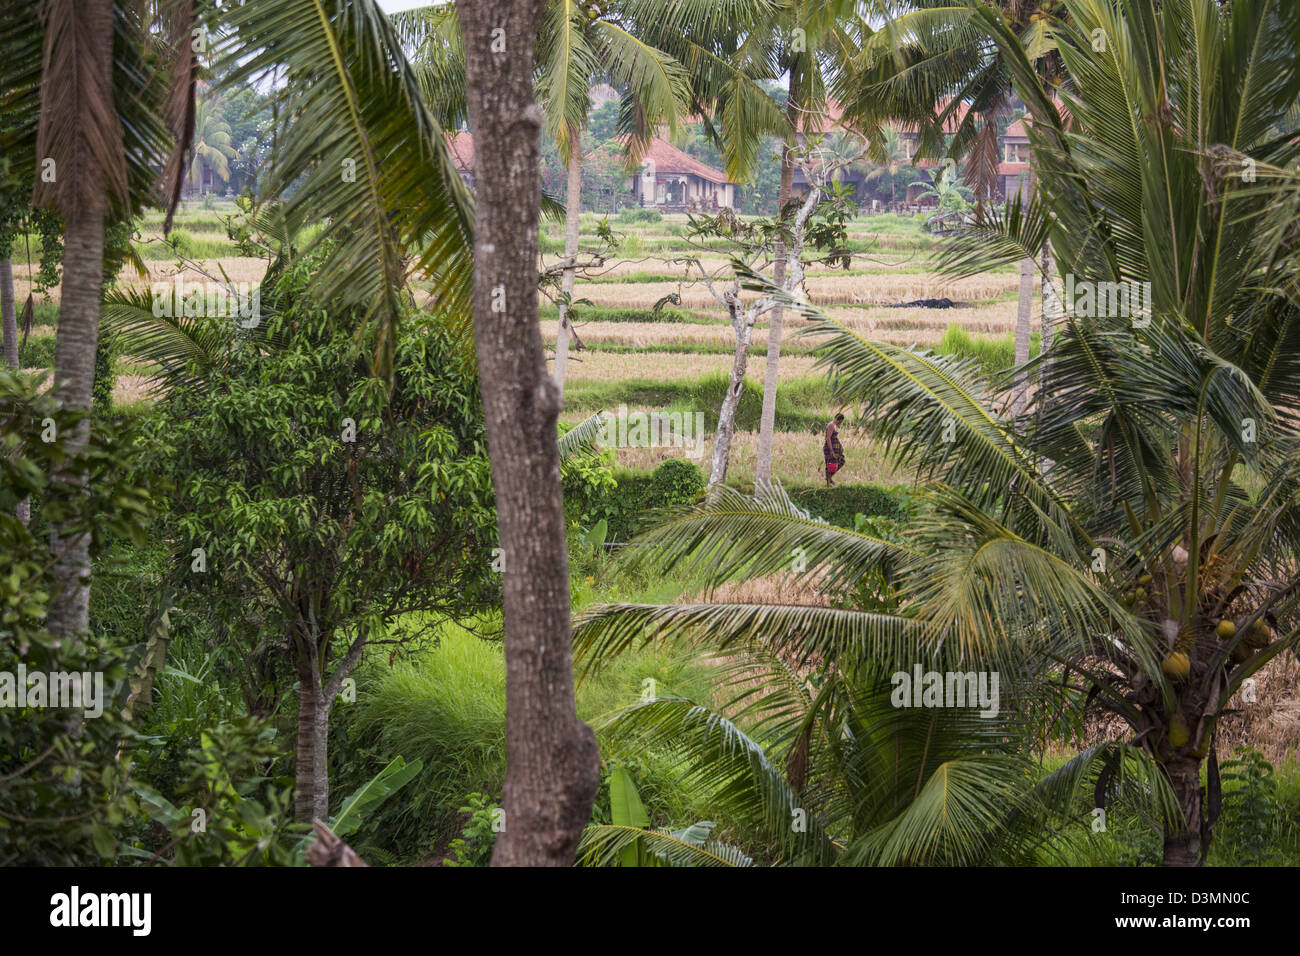 Rice fields in Ubud, Bali - Stock Image